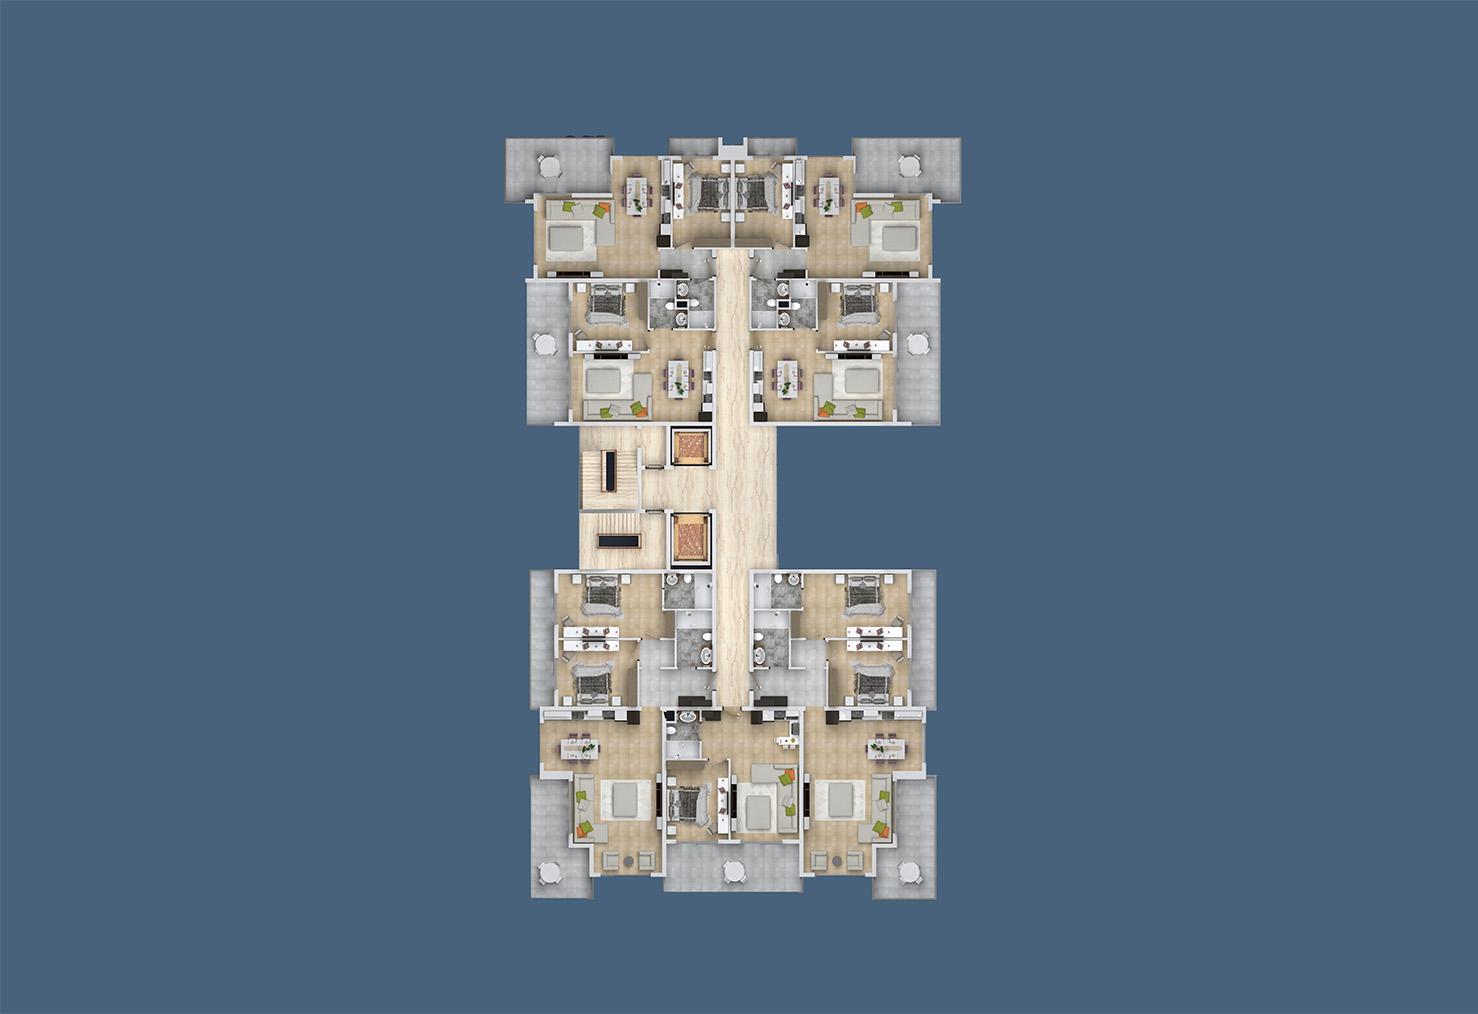 Floor plans of apartments 5 floor «D» Yekta Kingdom Trade Center